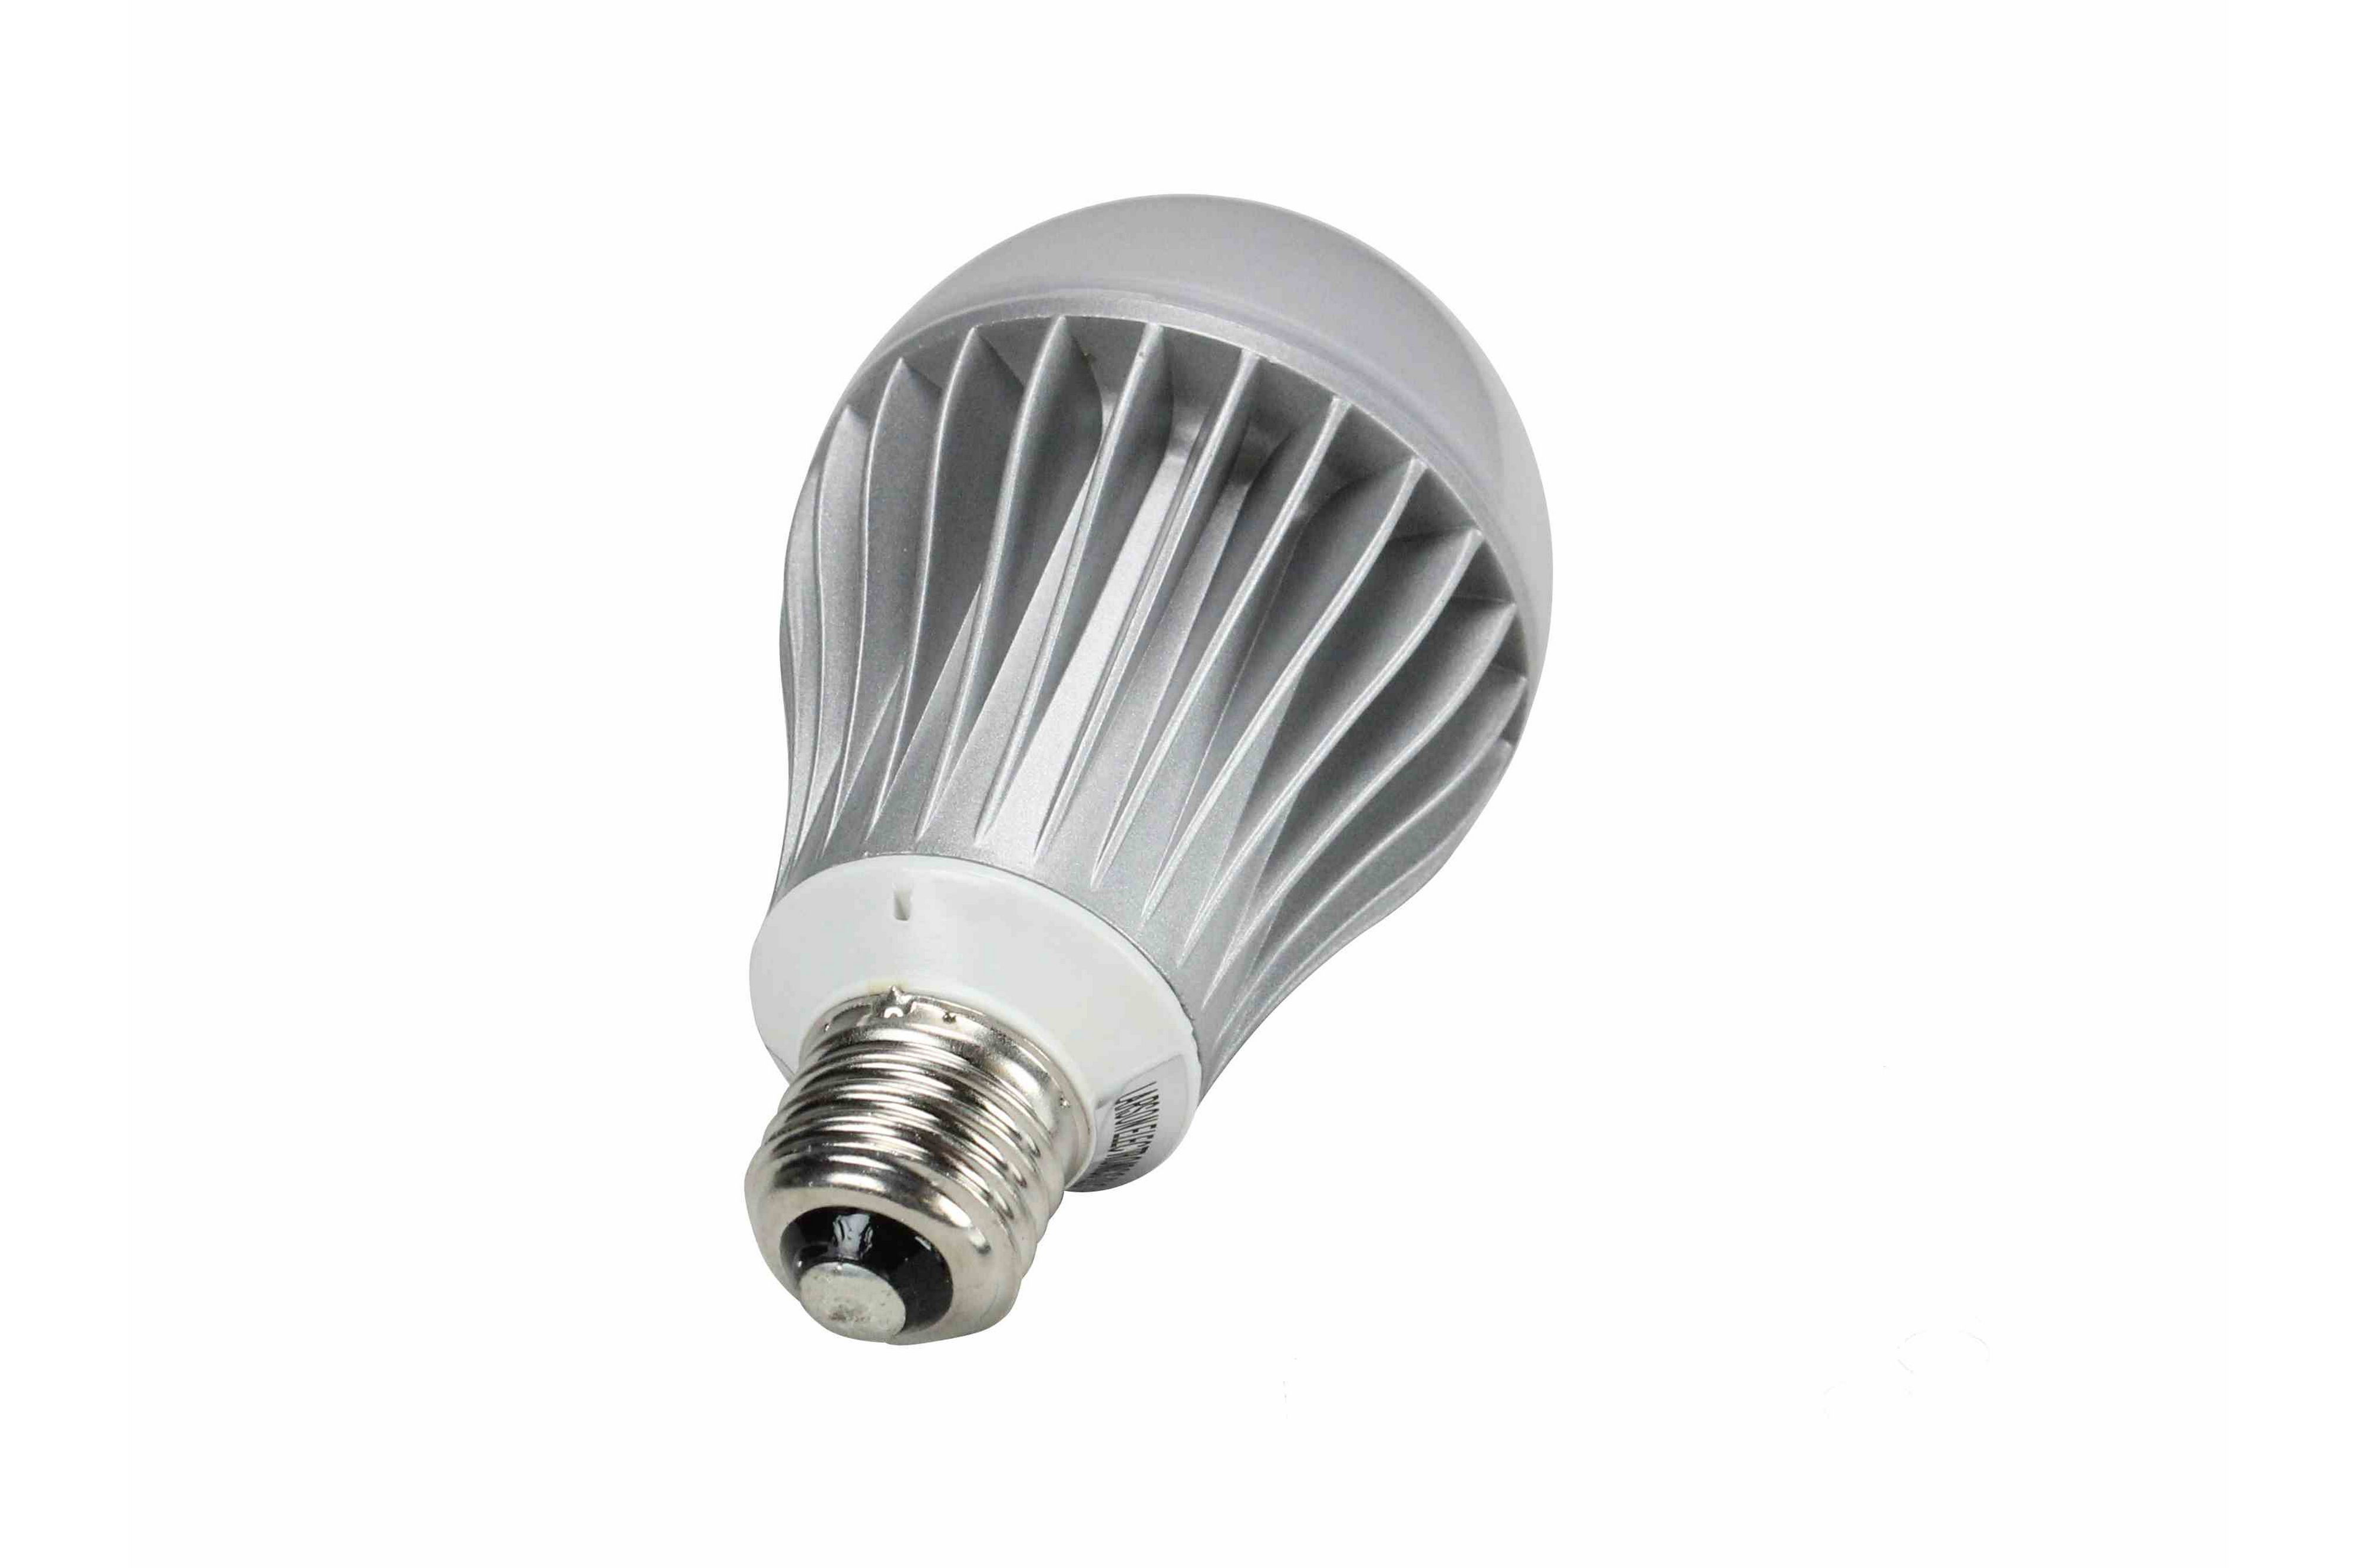 Rgb Led Lamp : Clearance diode dynamics multicolor fog drl led bulb kit hid